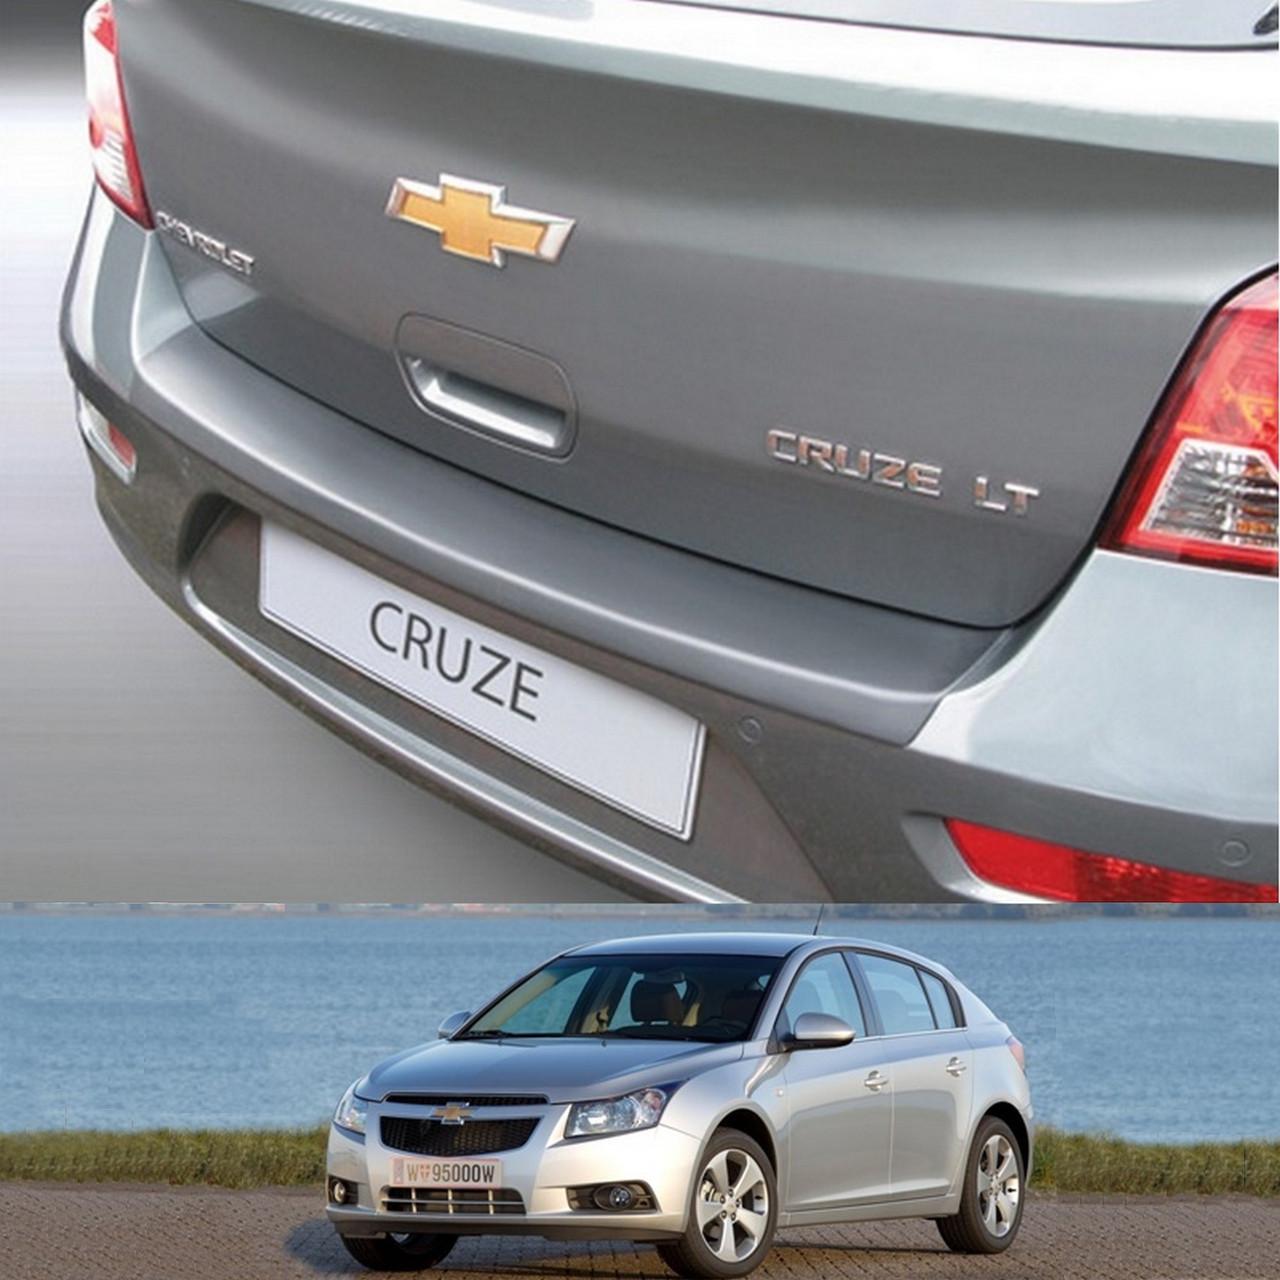 Пластиковая защитная накладка на задний бампер для Chevrolet Cruze 5dr 2011-2016